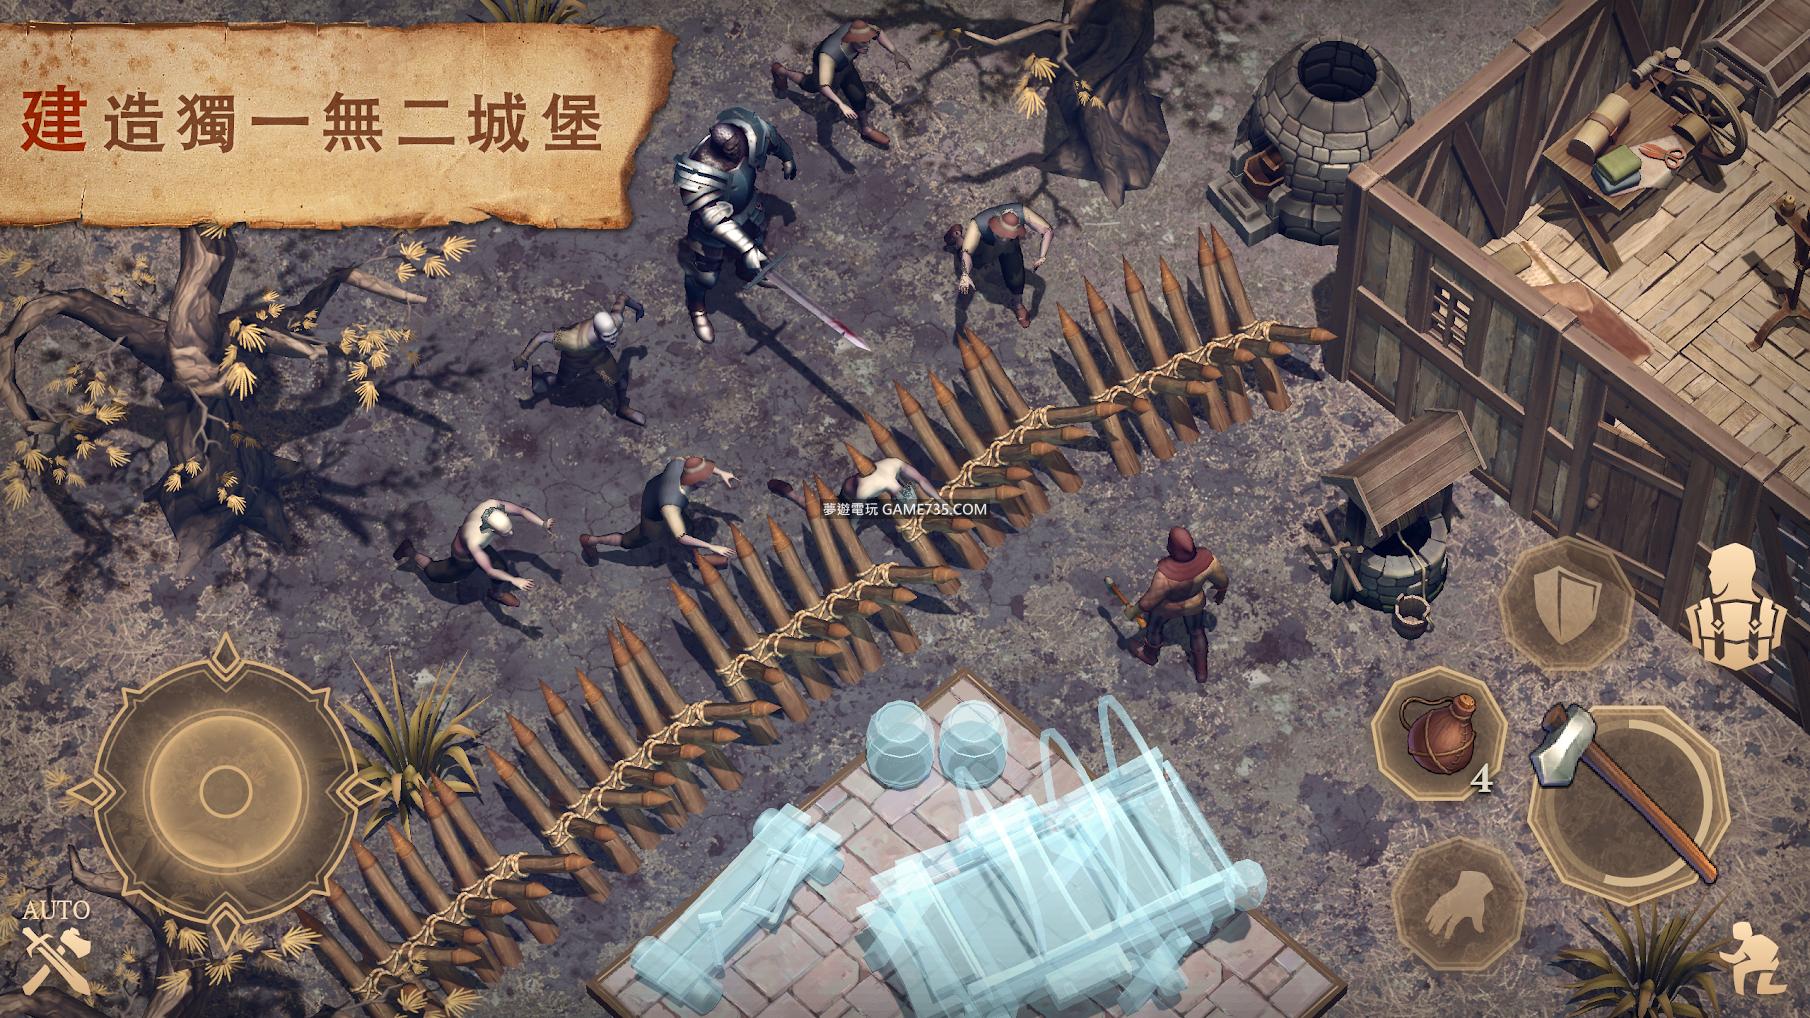 [修改版][生存+冷酷靈魂]Grim Soul: Dark Fantasy Survival V3.0.1 多種修改+中文